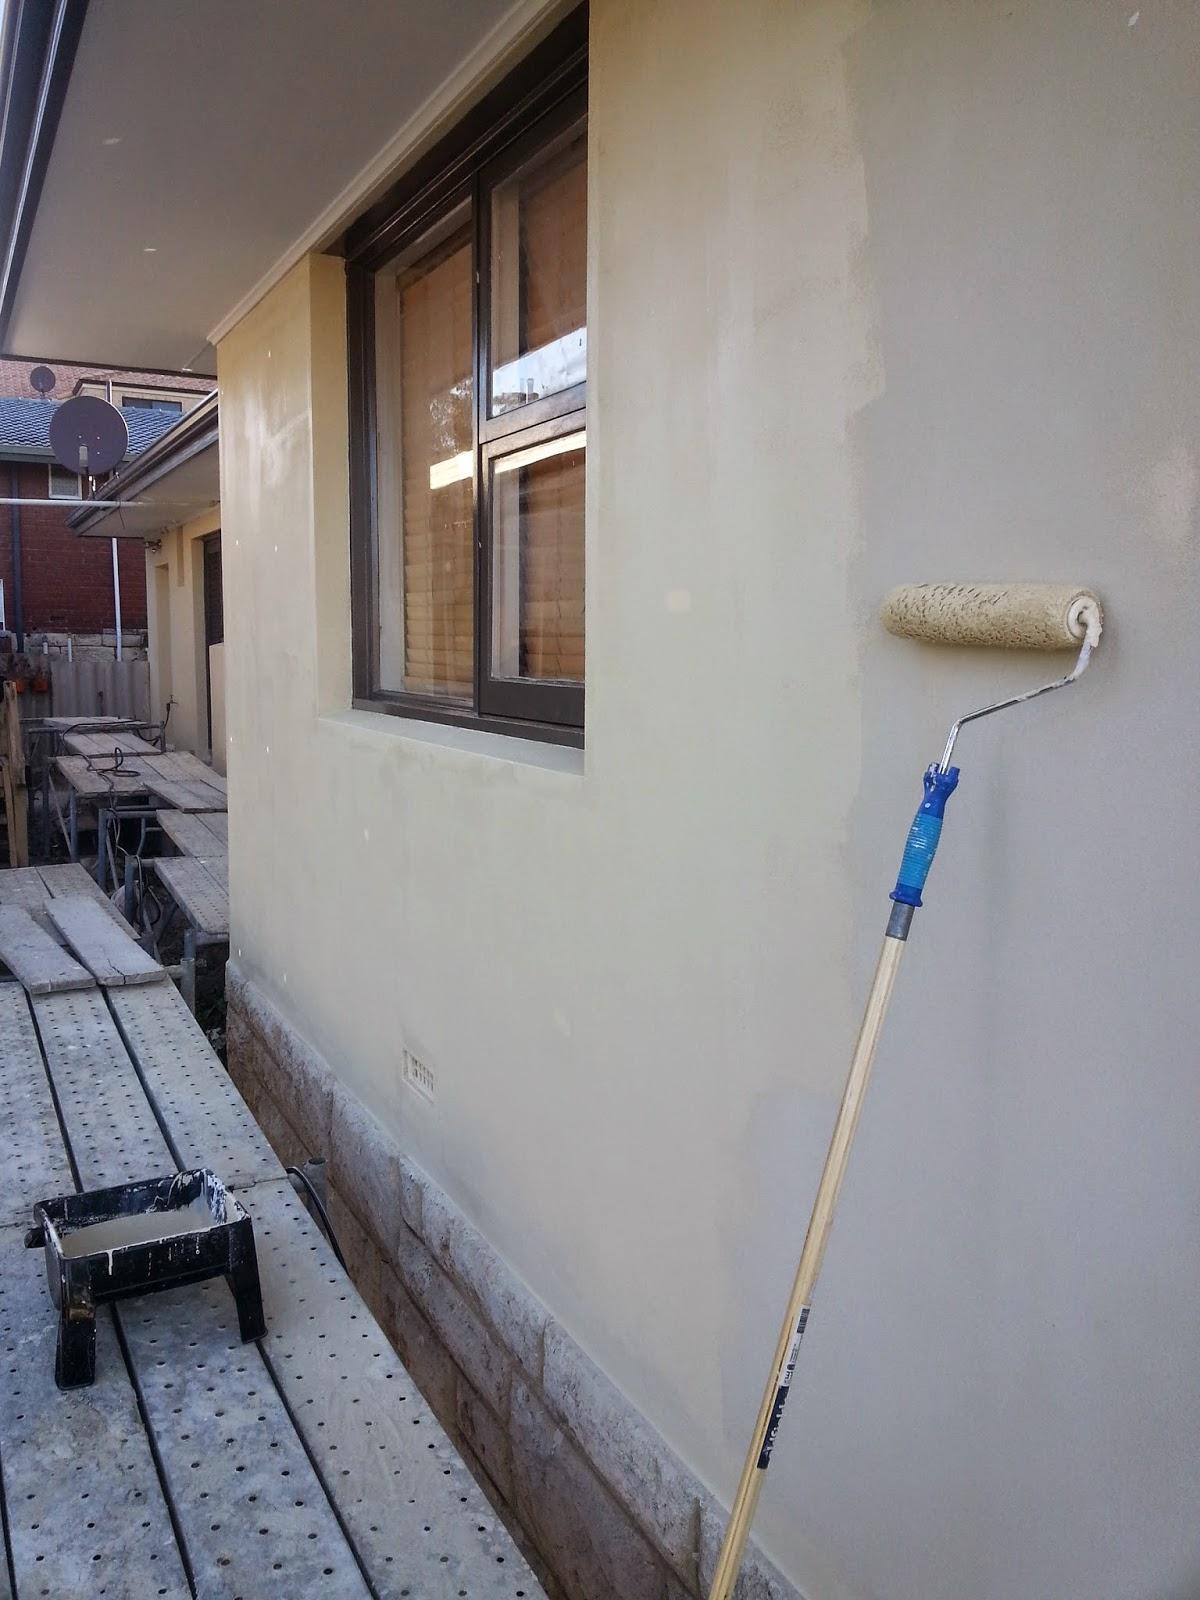 Jarrah Jungle Painting The Exterior Walls And Window